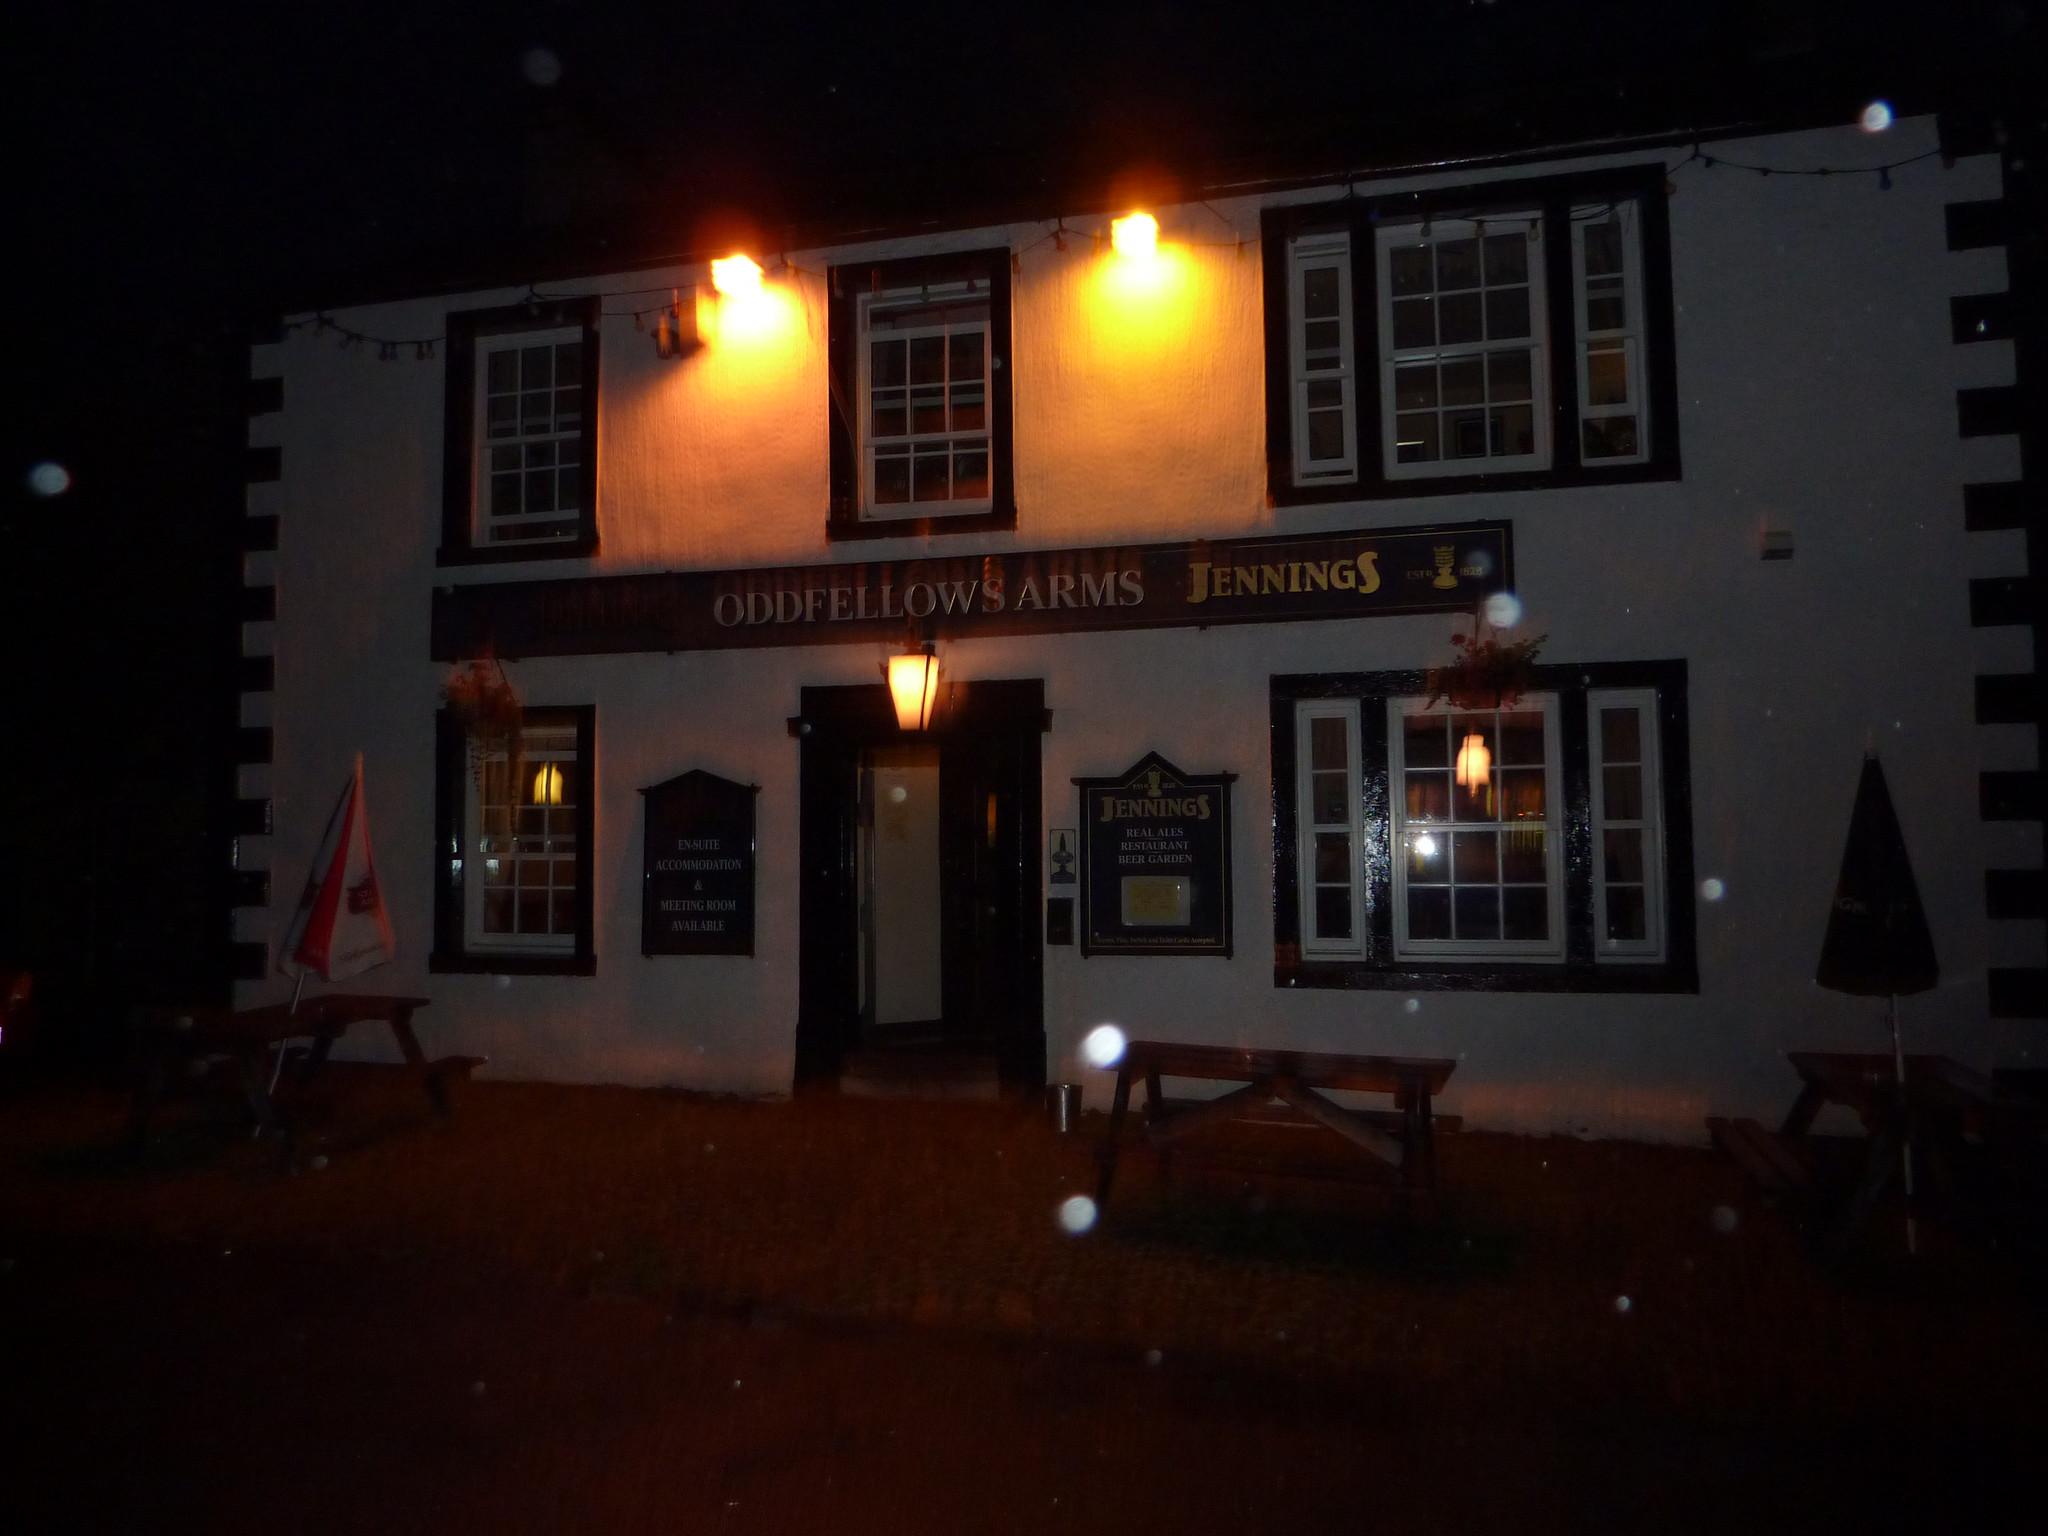 The Oddfellows Arms, Caldbeck